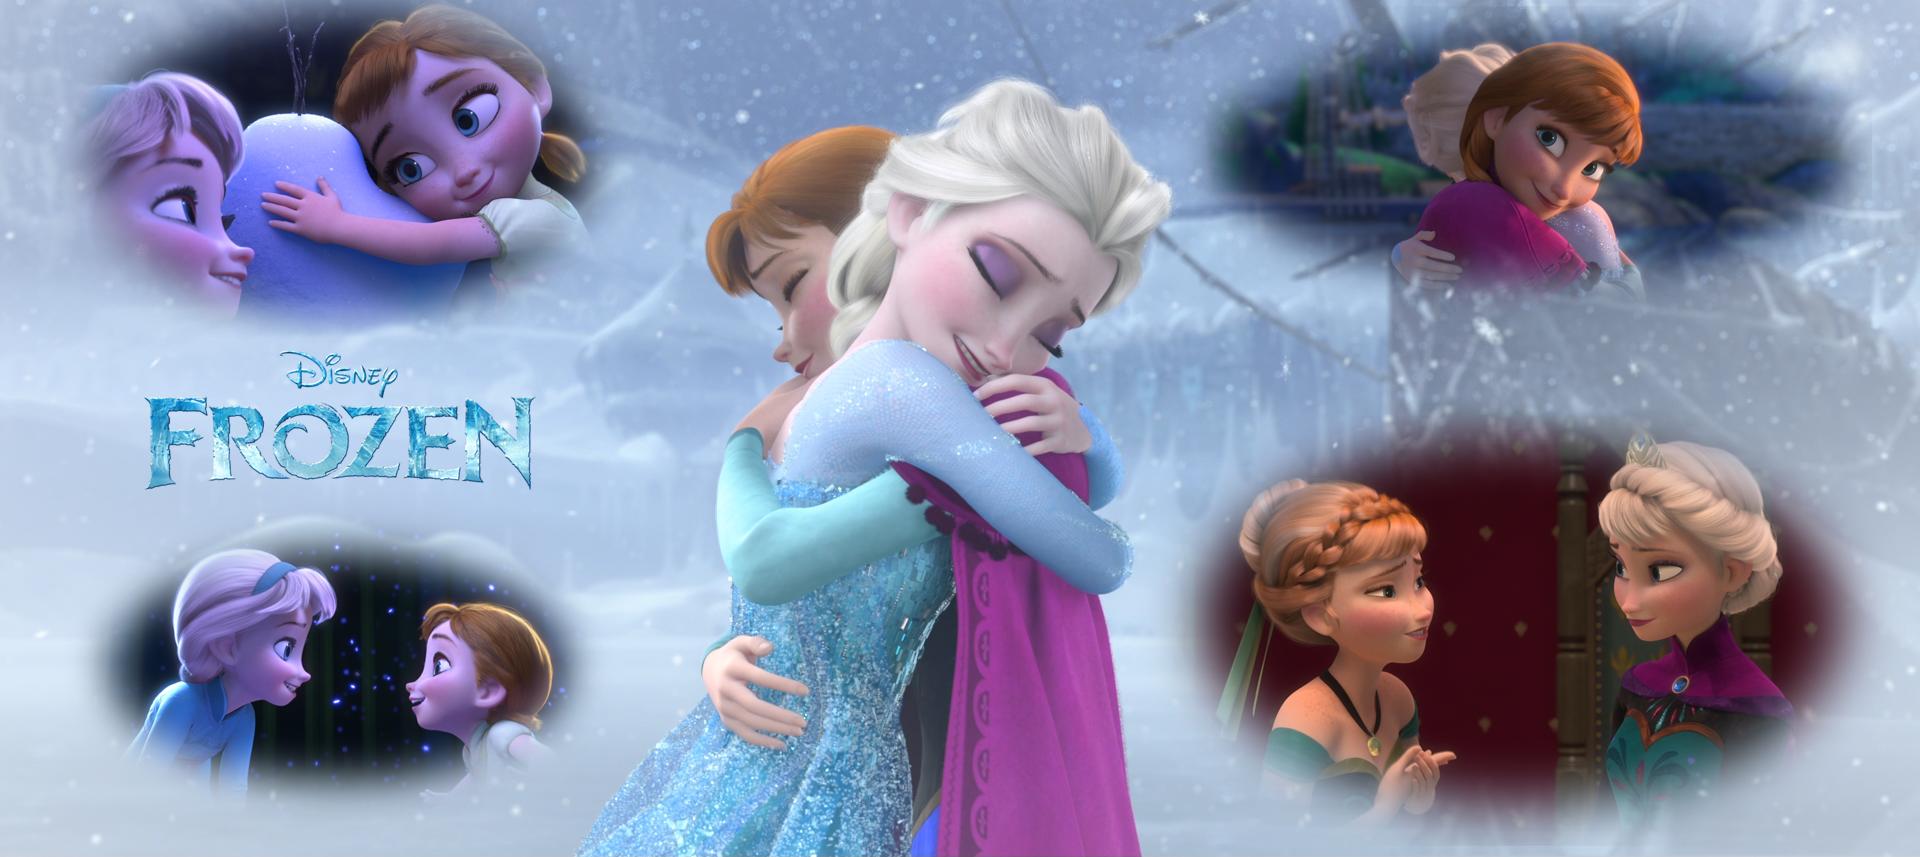 Free Download Elsa And Anna Wallpaper From Rfrozen Iimgurcom